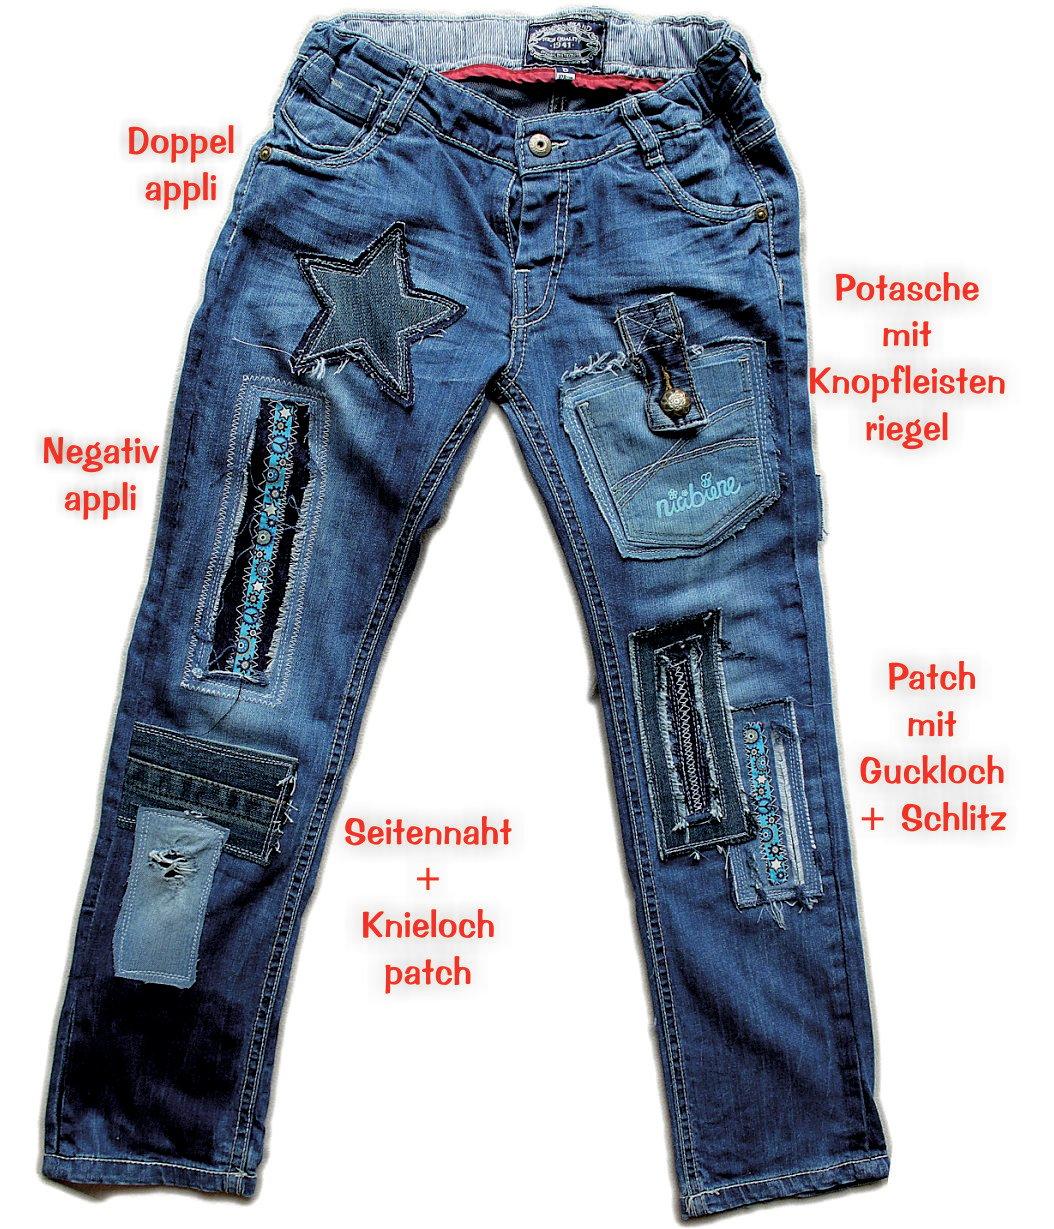 jeanshose mit loch freestyle flicken handmade kultur. Black Bedroom Furniture Sets. Home Design Ideas